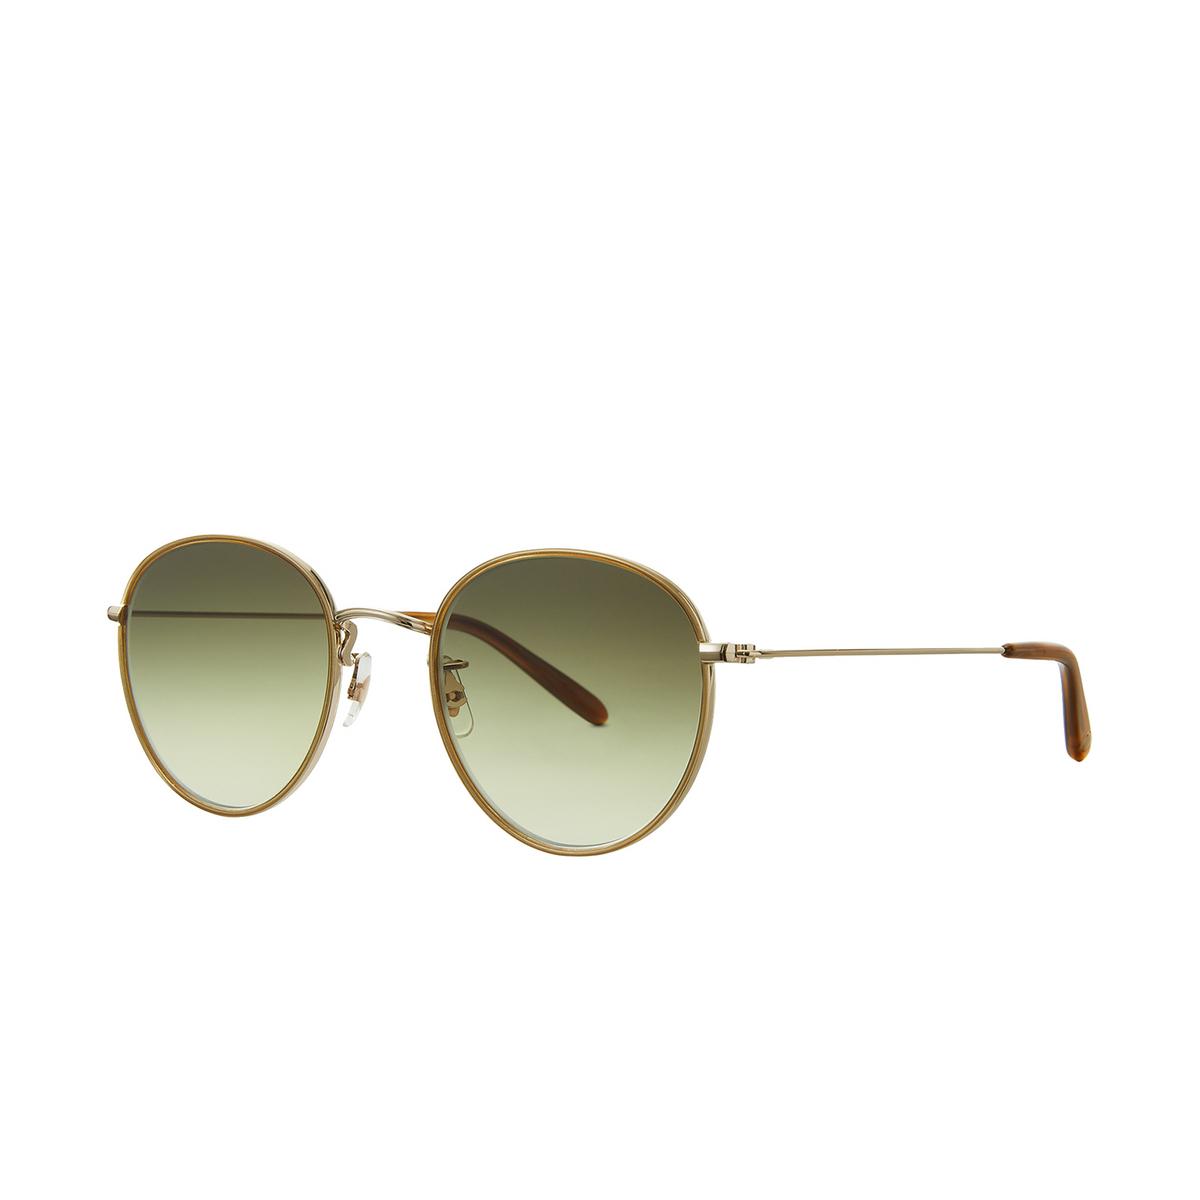 Garrett Leight® Round Sunglasses: Paloma Sun color Champagne-gold Ch-g-d/sfog - 2/2.